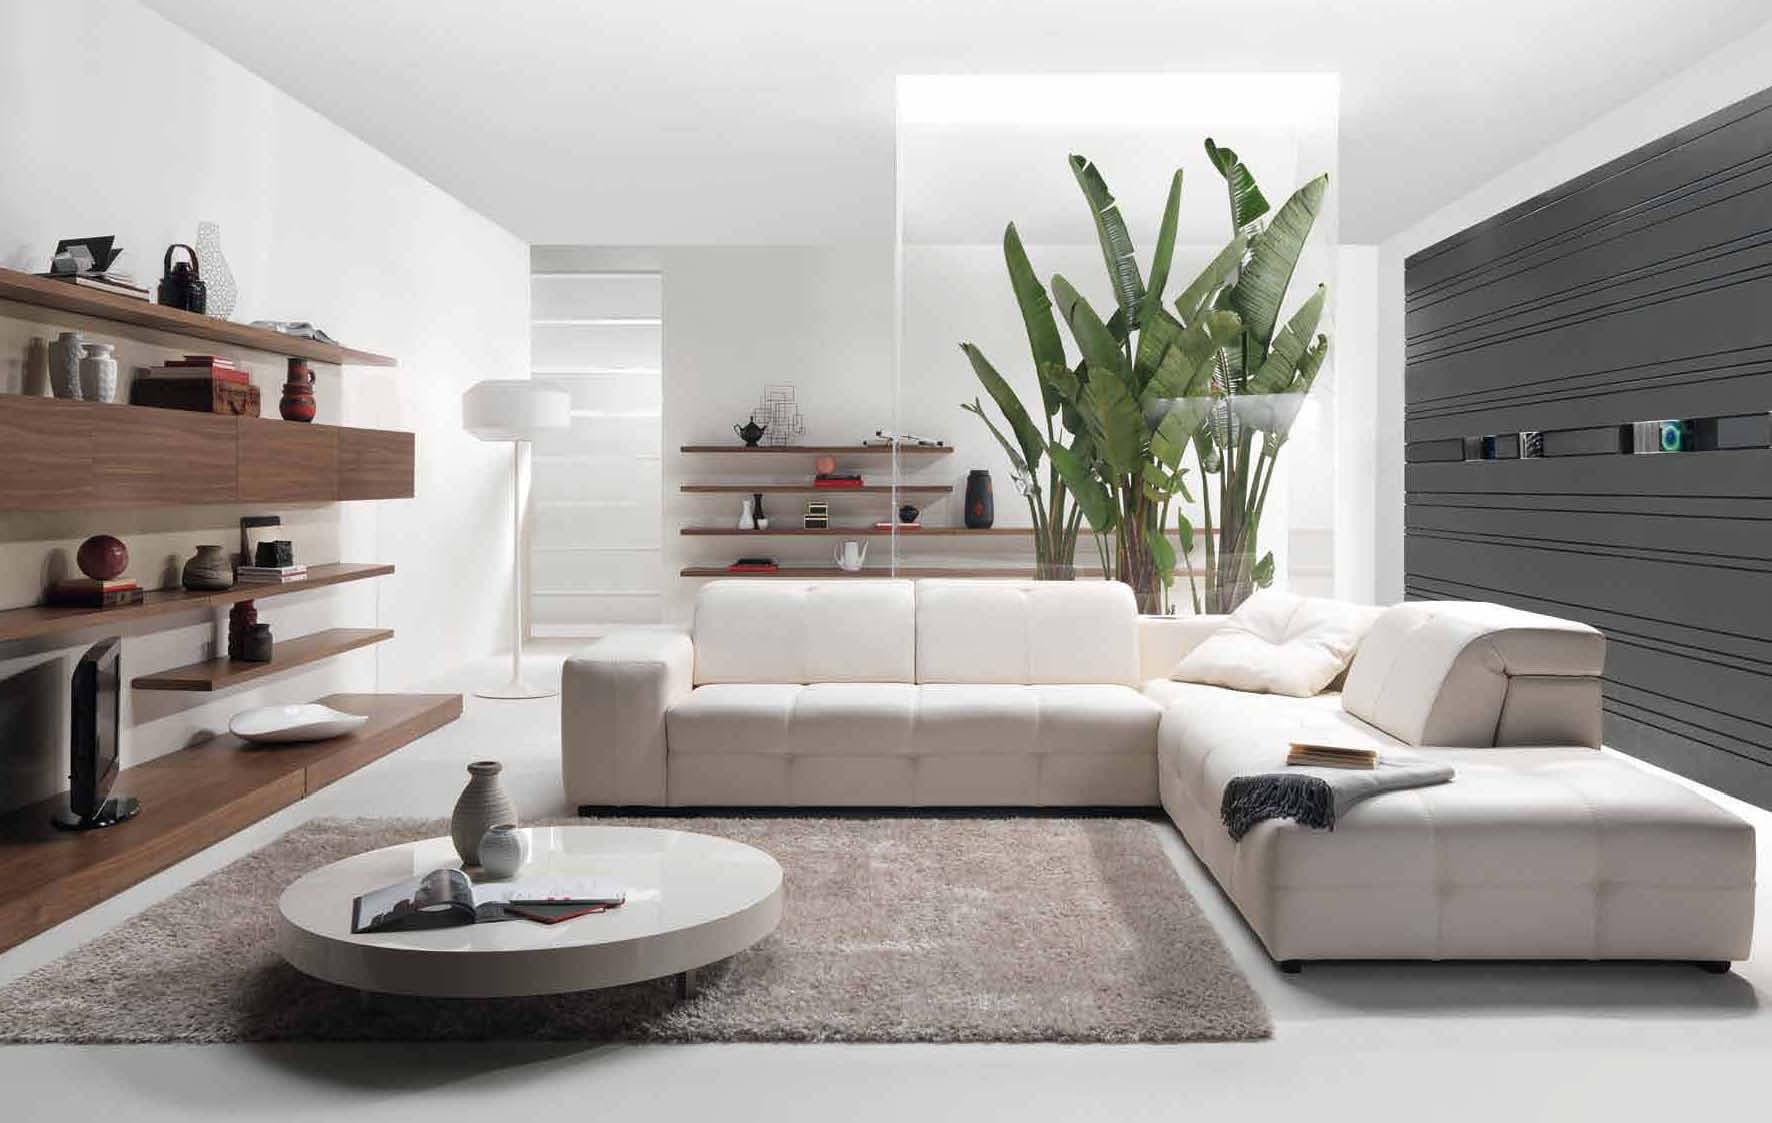 Customized-Sofas-white living room